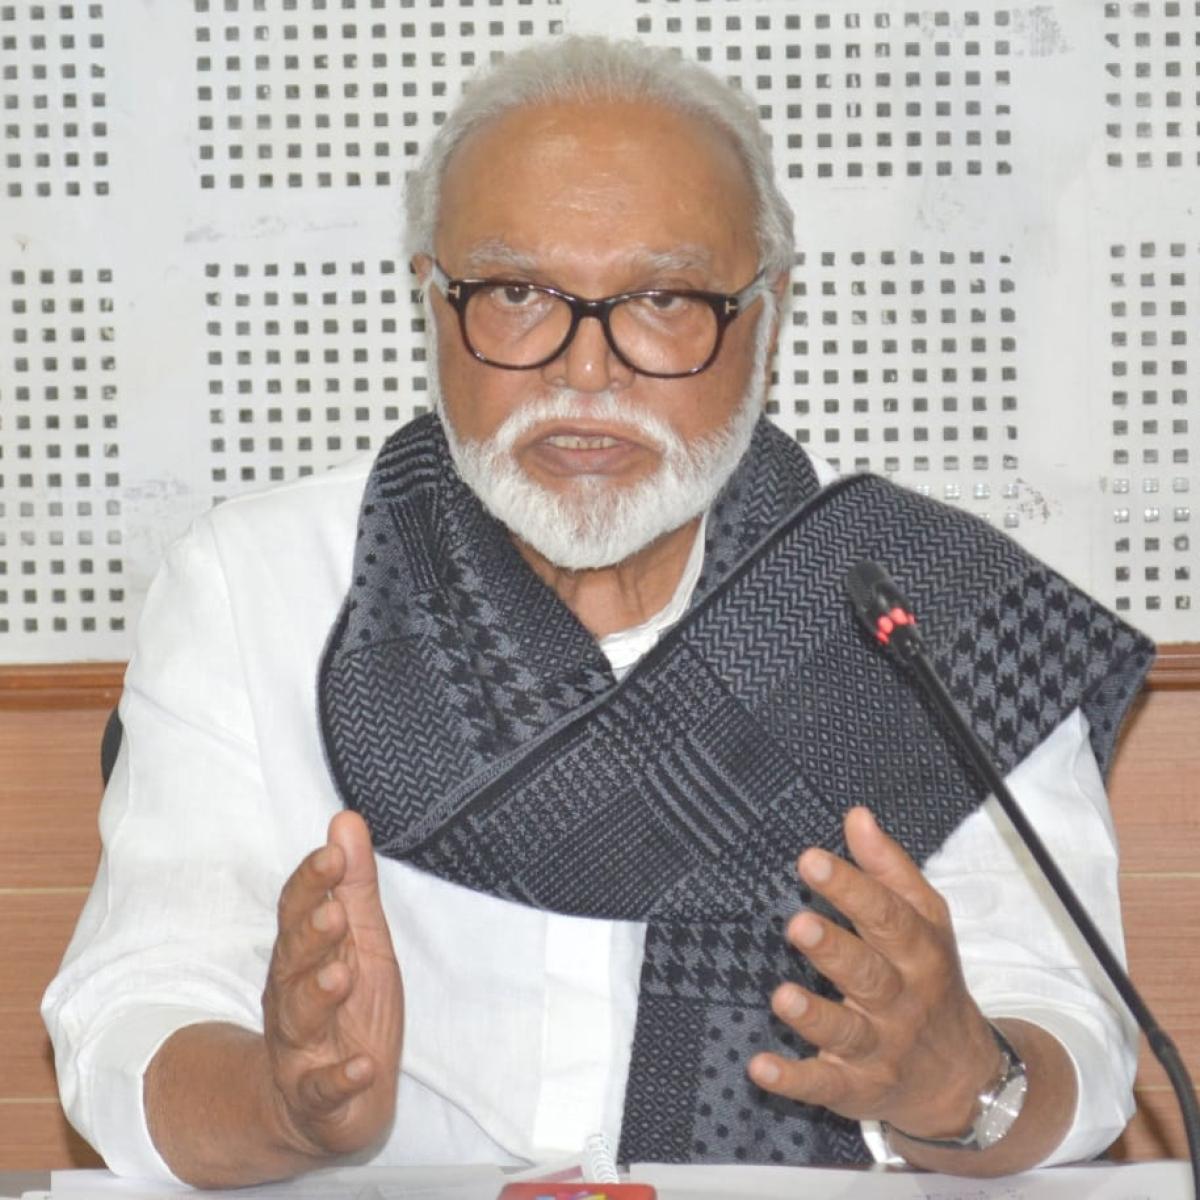 Maharashtra: Chhagan Bhujbal urges Uddhav Thackeray to launch CM Garib Kalyan Yojana for distribution of pulses, sugar, salt, edible oil at concessional rates or for free